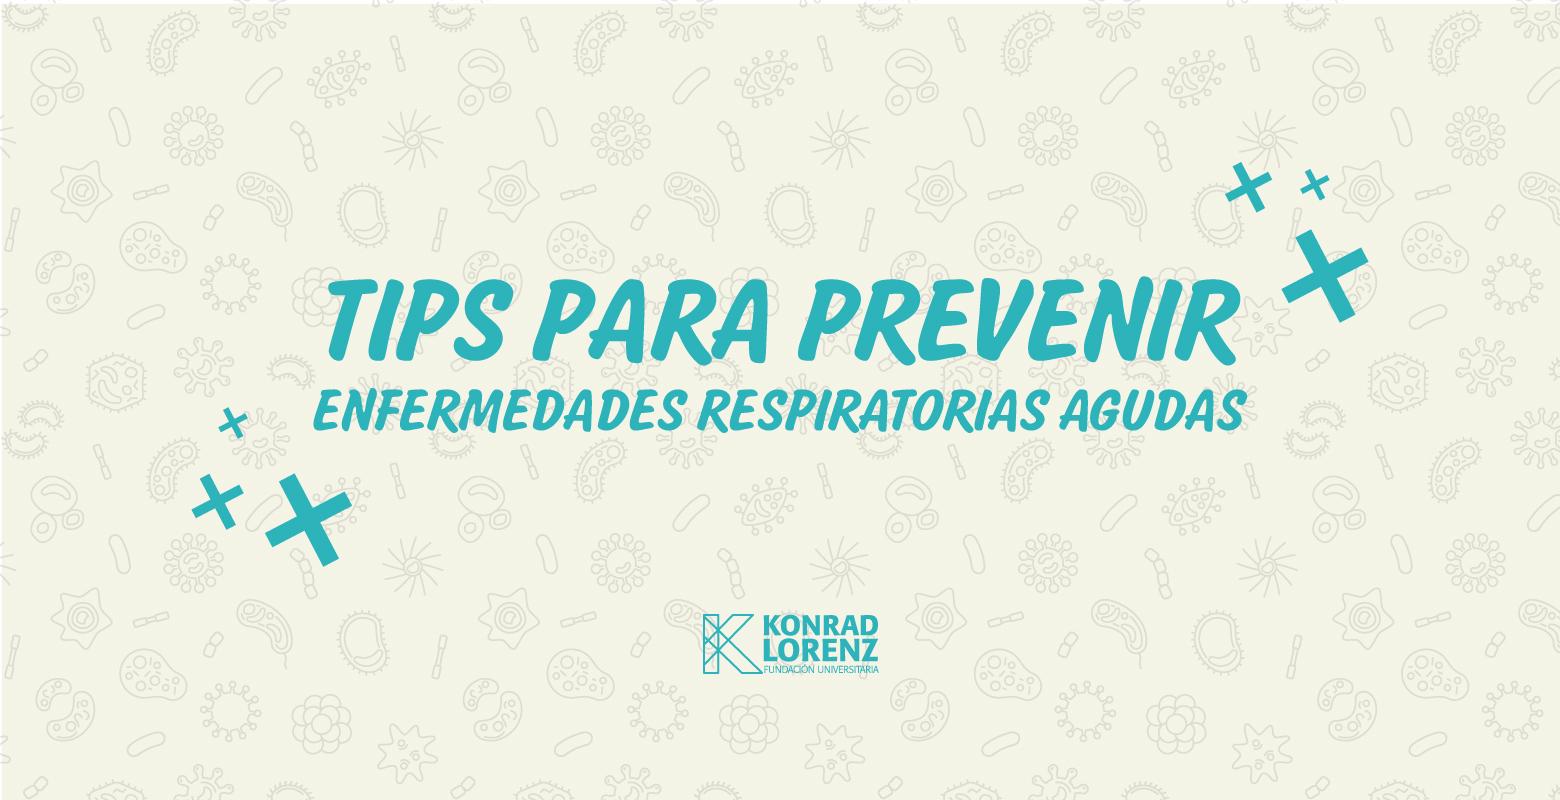 Tips para prevenir enfermedades respiratorias agudas